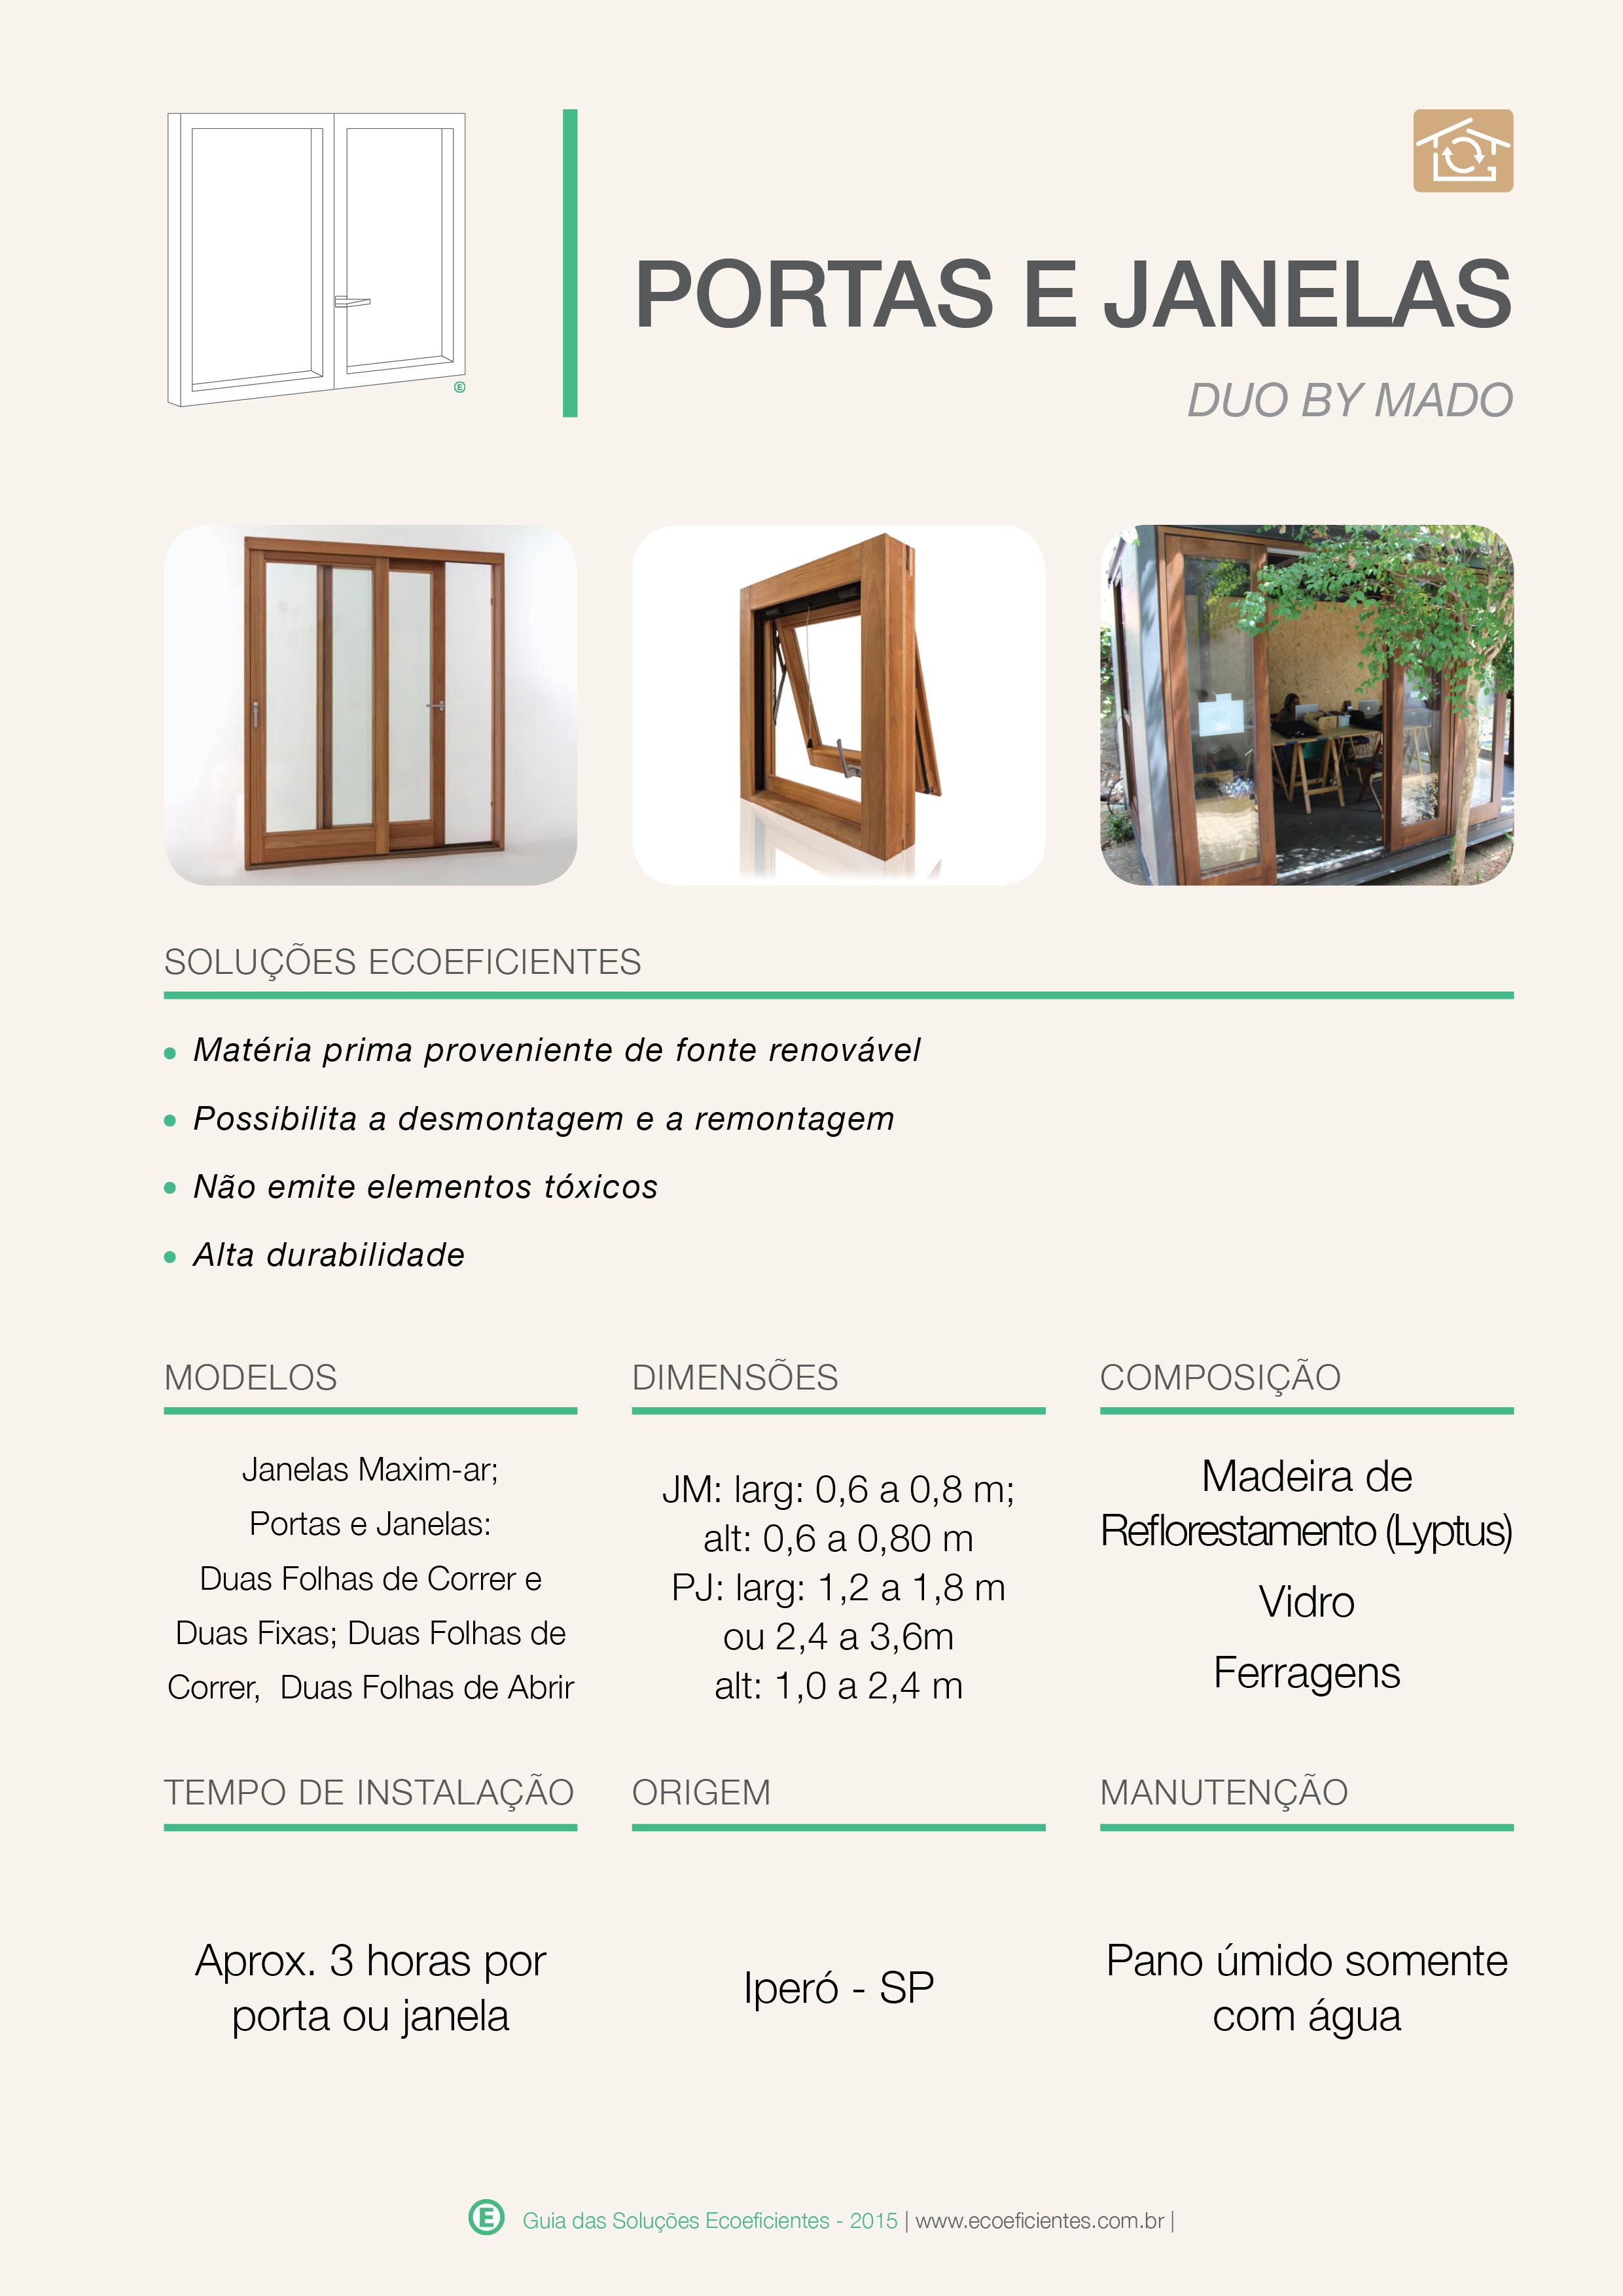 26-portas-e-janelas-duo-by-mado